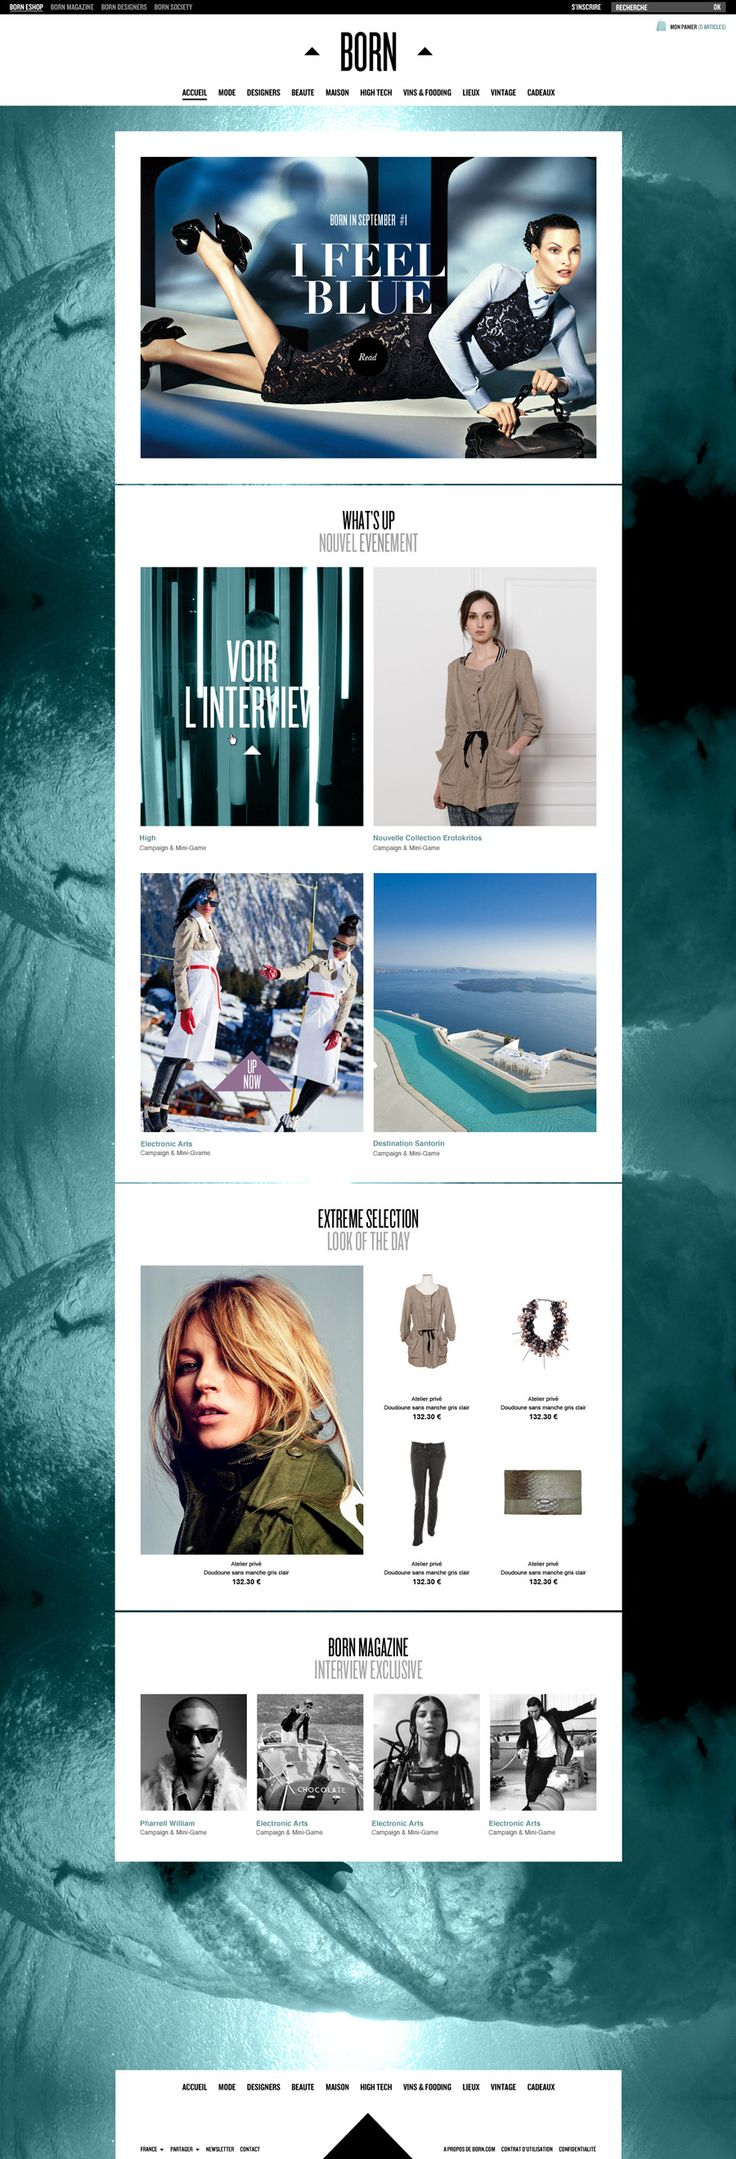 BORN #MAGAZINE - Isabelle Gusching #grid #web #design